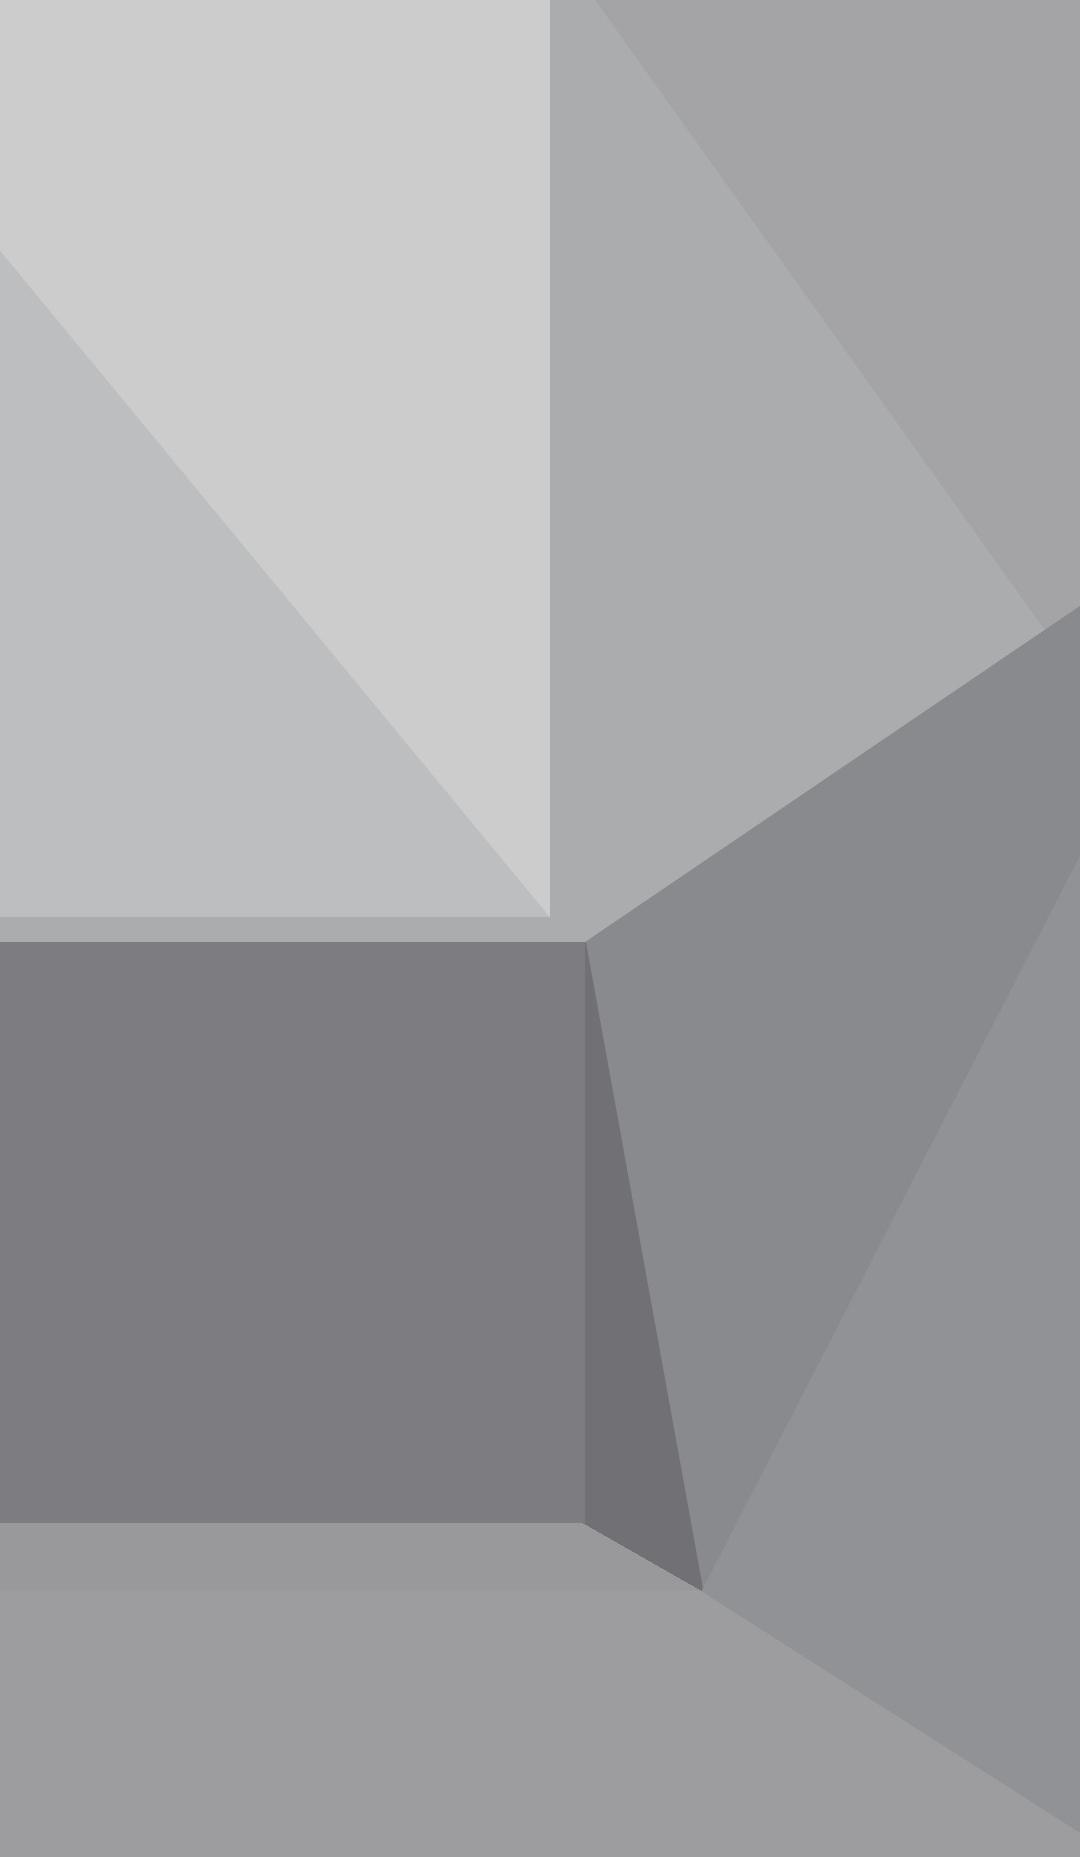 Xiaomi Redmi 4x Stock Wallpapers 5 1080 X 1857